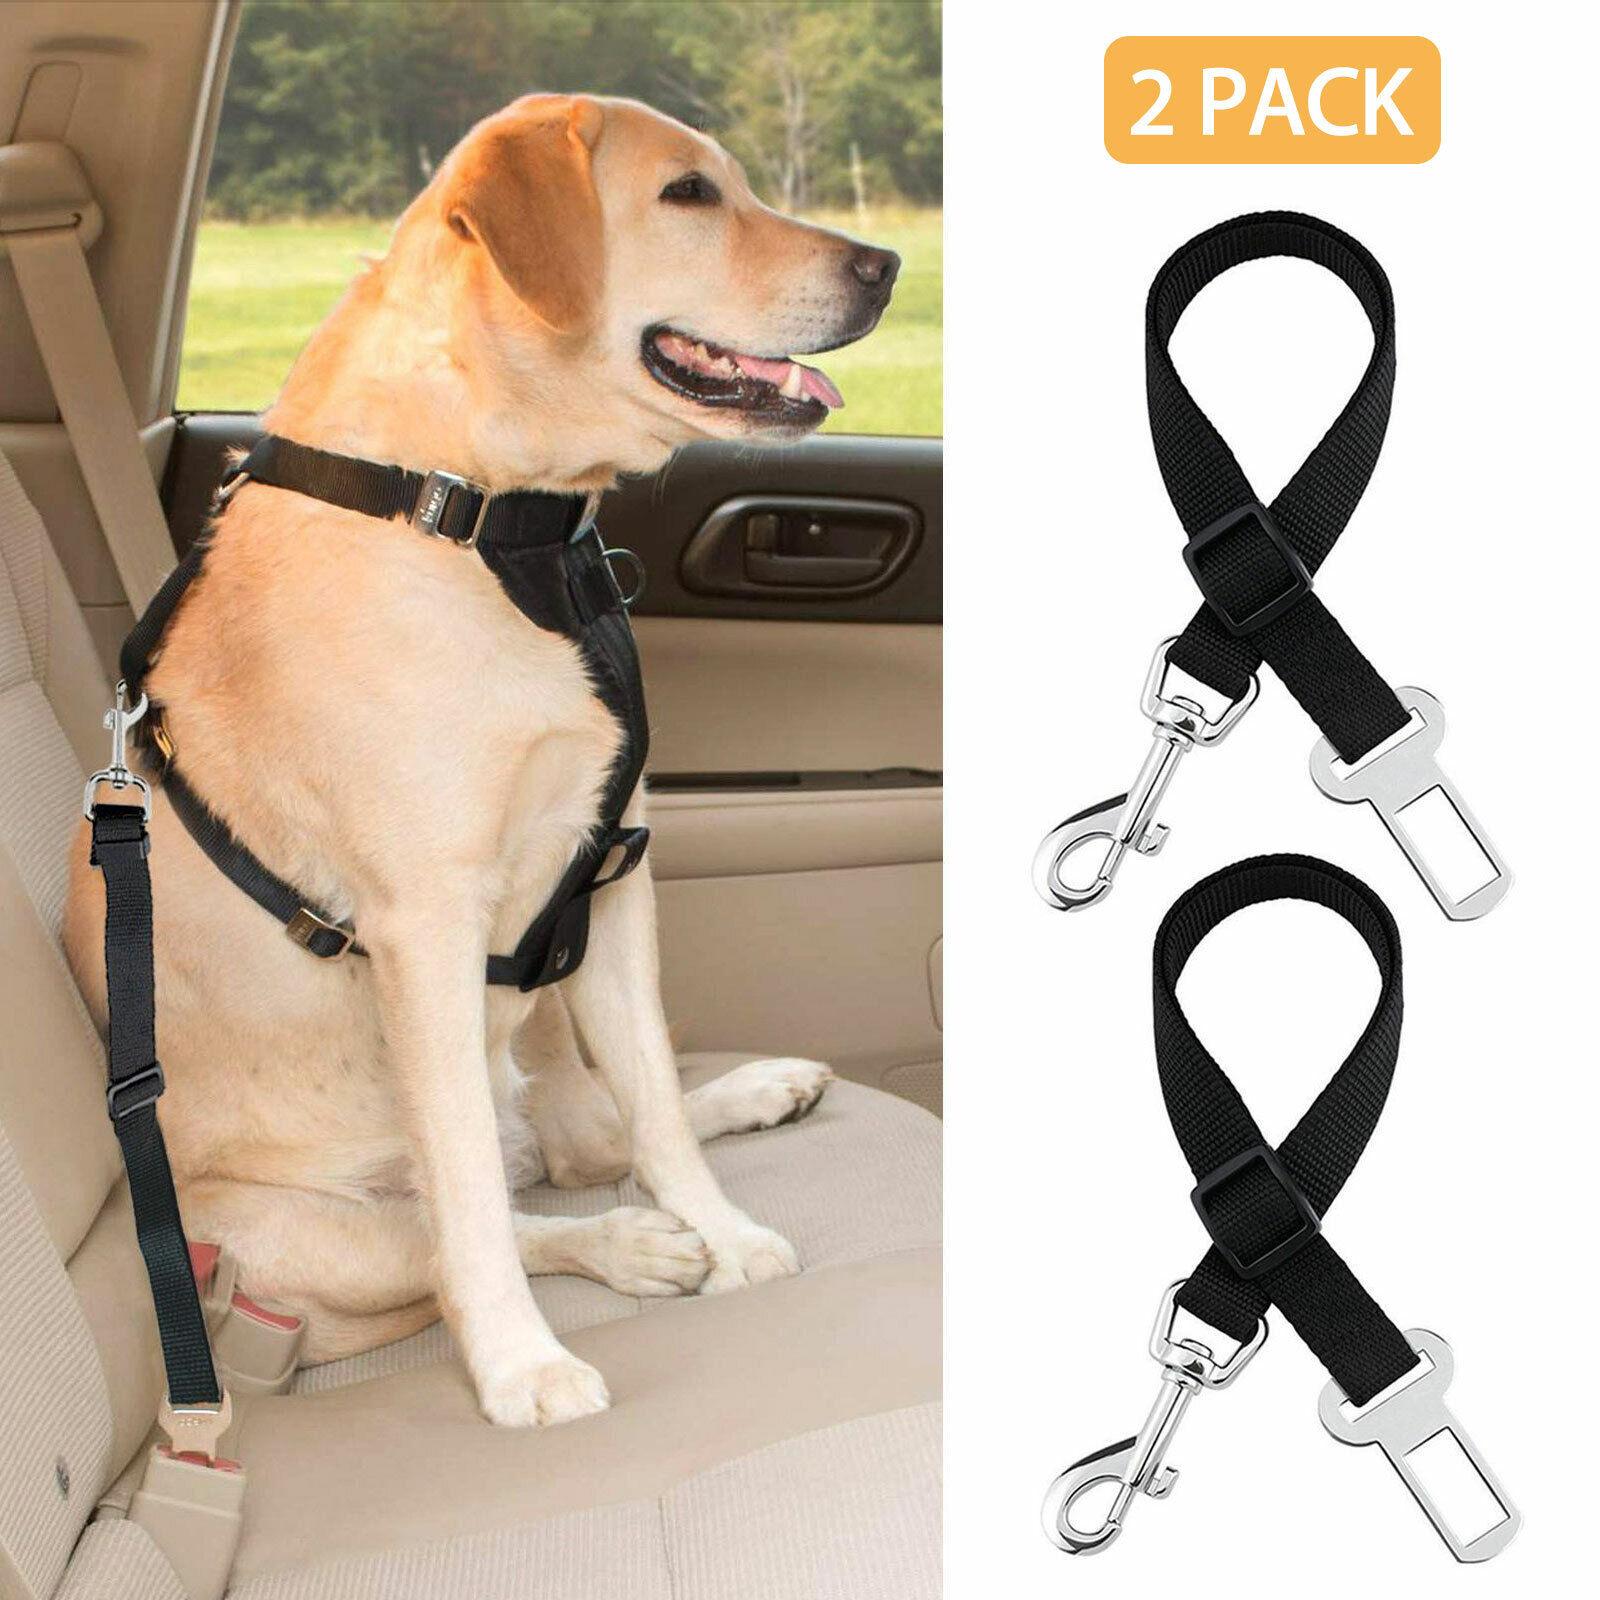 2X Cat Dog Pet Safety Seatbelt Car Vehicle Adjustable Seat B